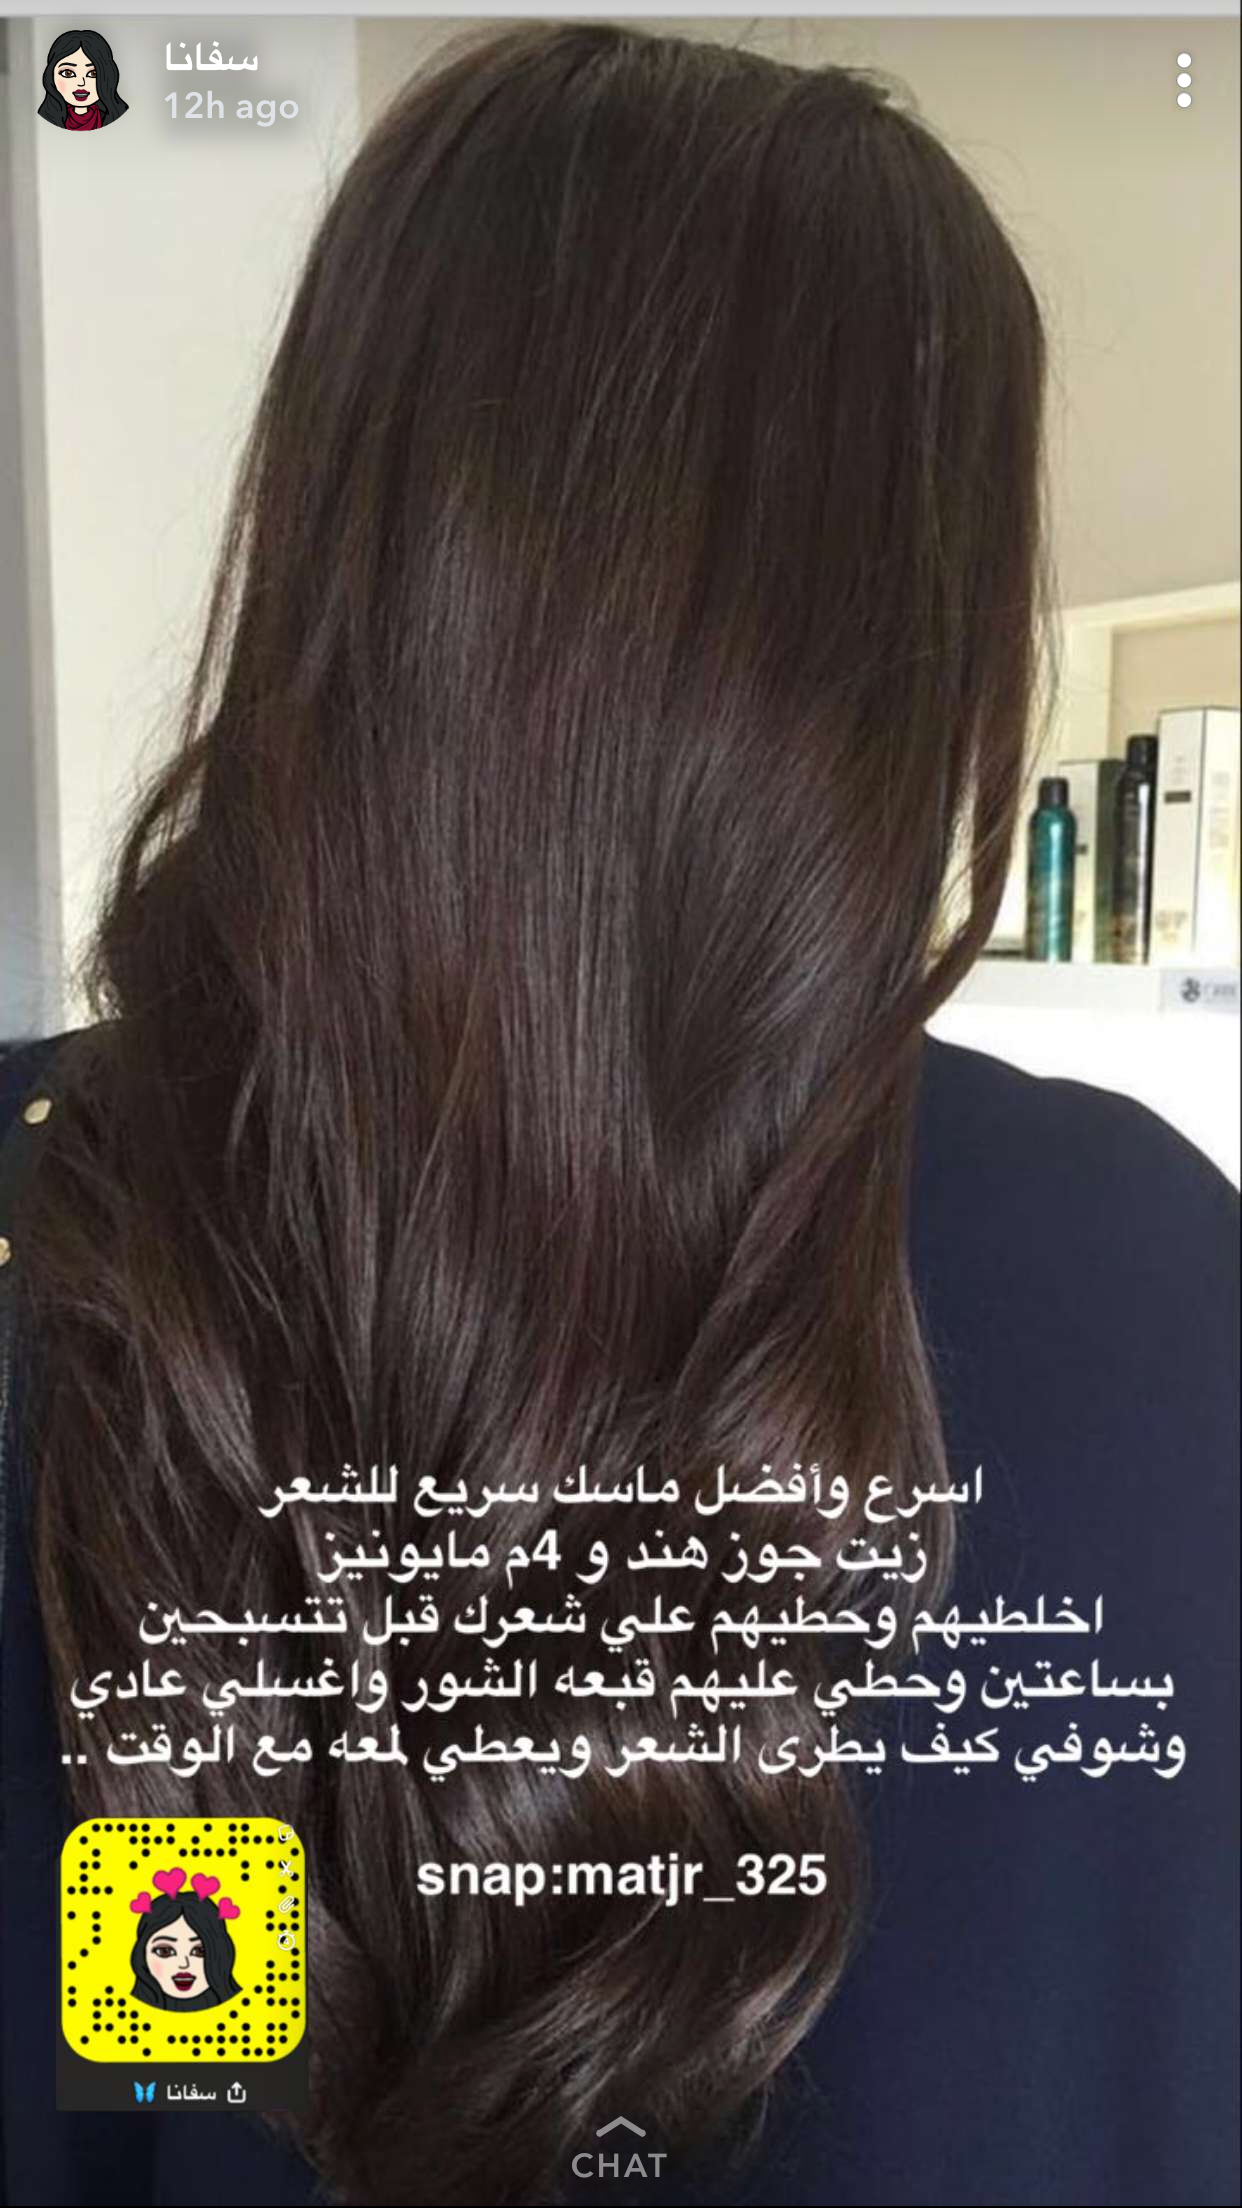 Pin By Amal Asiri On الجمال Hair Care Oils Beauty Recipes Hair Diy Hair Treatment